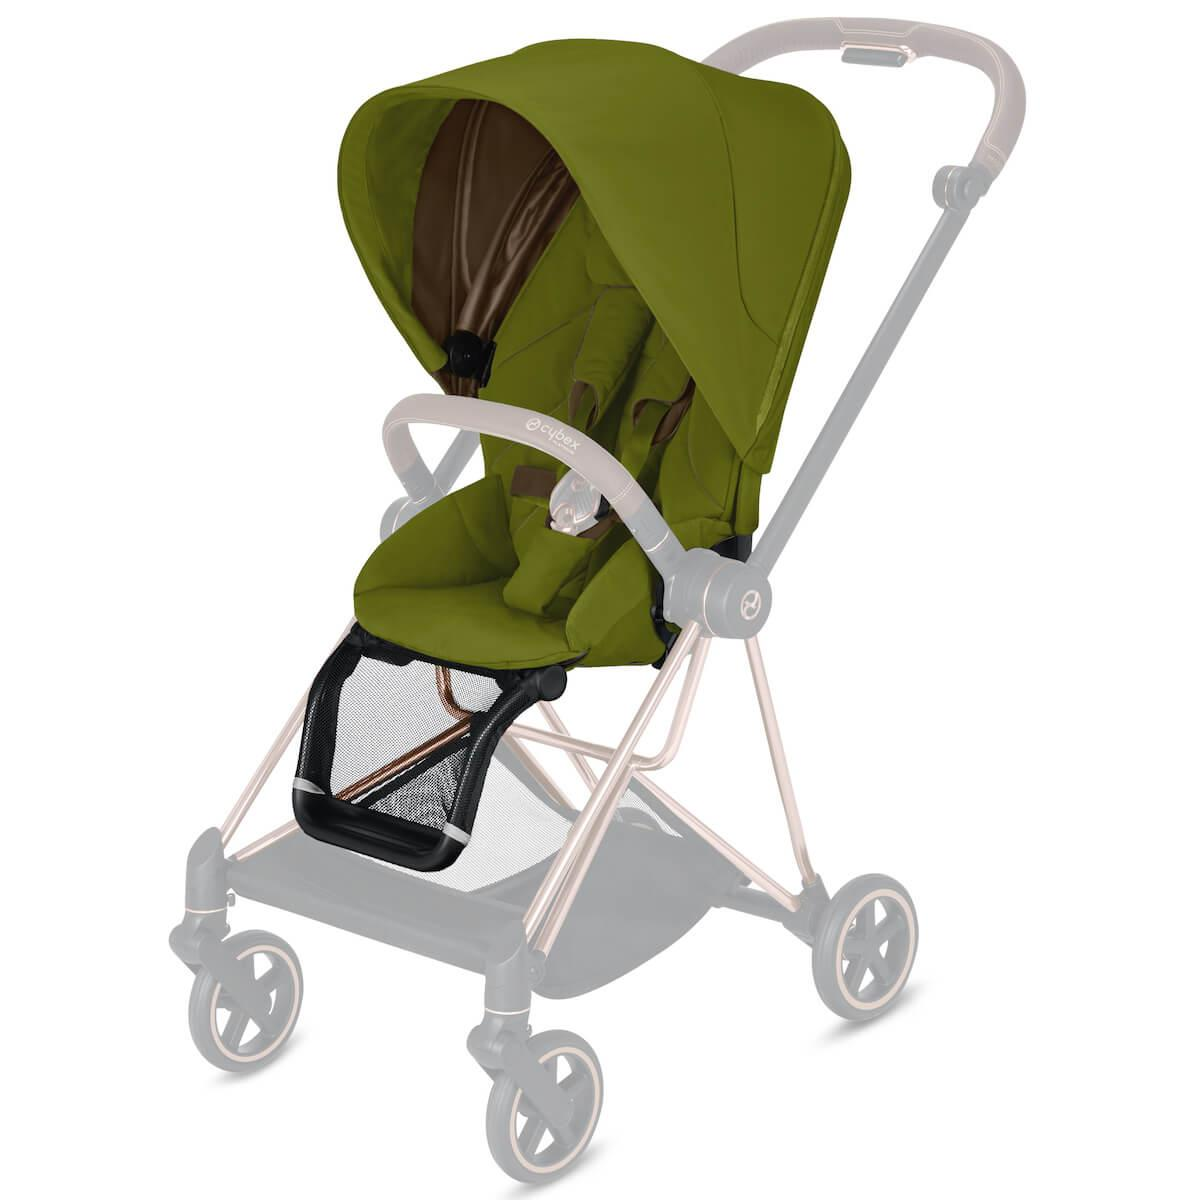 Seat Pack MIOS Cybex Khaki Green